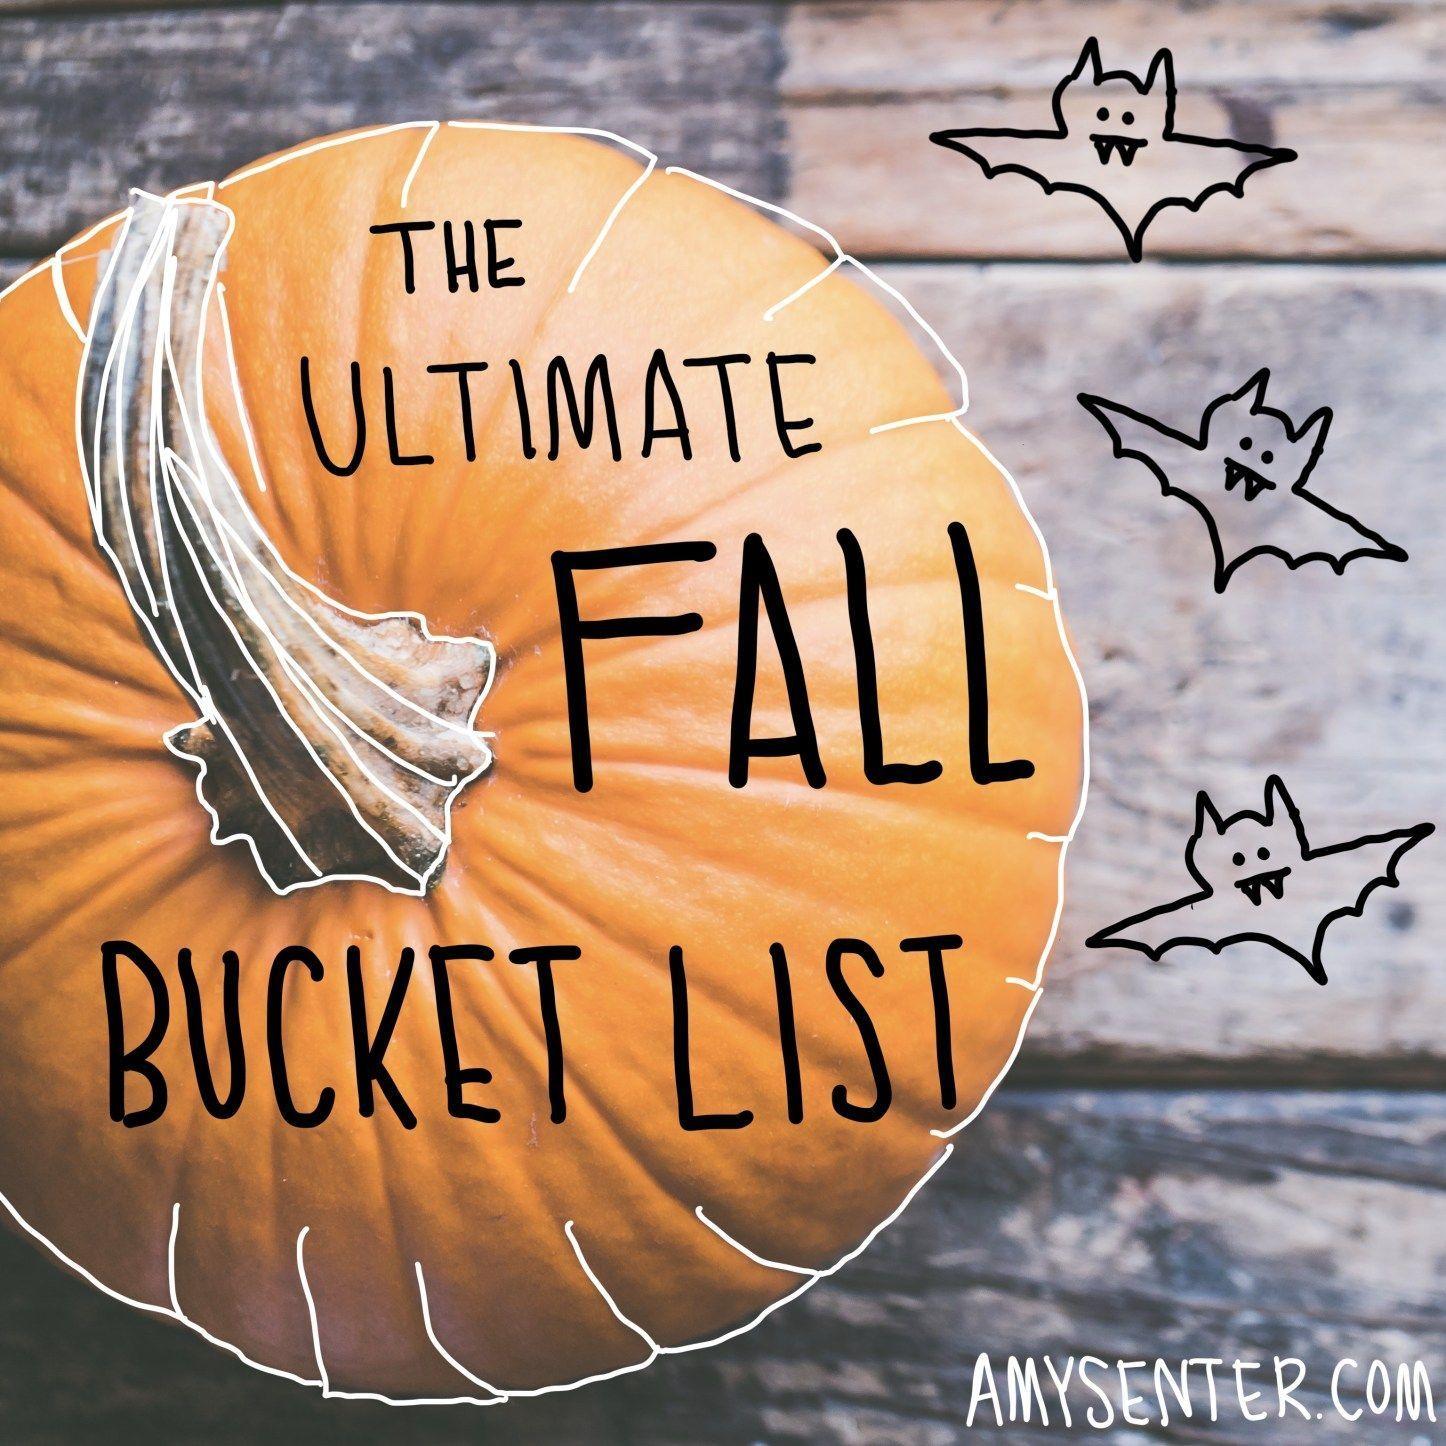 The Ultimate Fall Bucket List Printable | Amy Senter #fallbucketlist The Ultimate Fall Bucket List Printable | Amy Senter #fallbucketlist The Ultimate Fall Bucket List Printable | Amy Senter #fallbucketlist The Ultimate Fall Bucket List Printable | Amy Senter #fallbucketlist